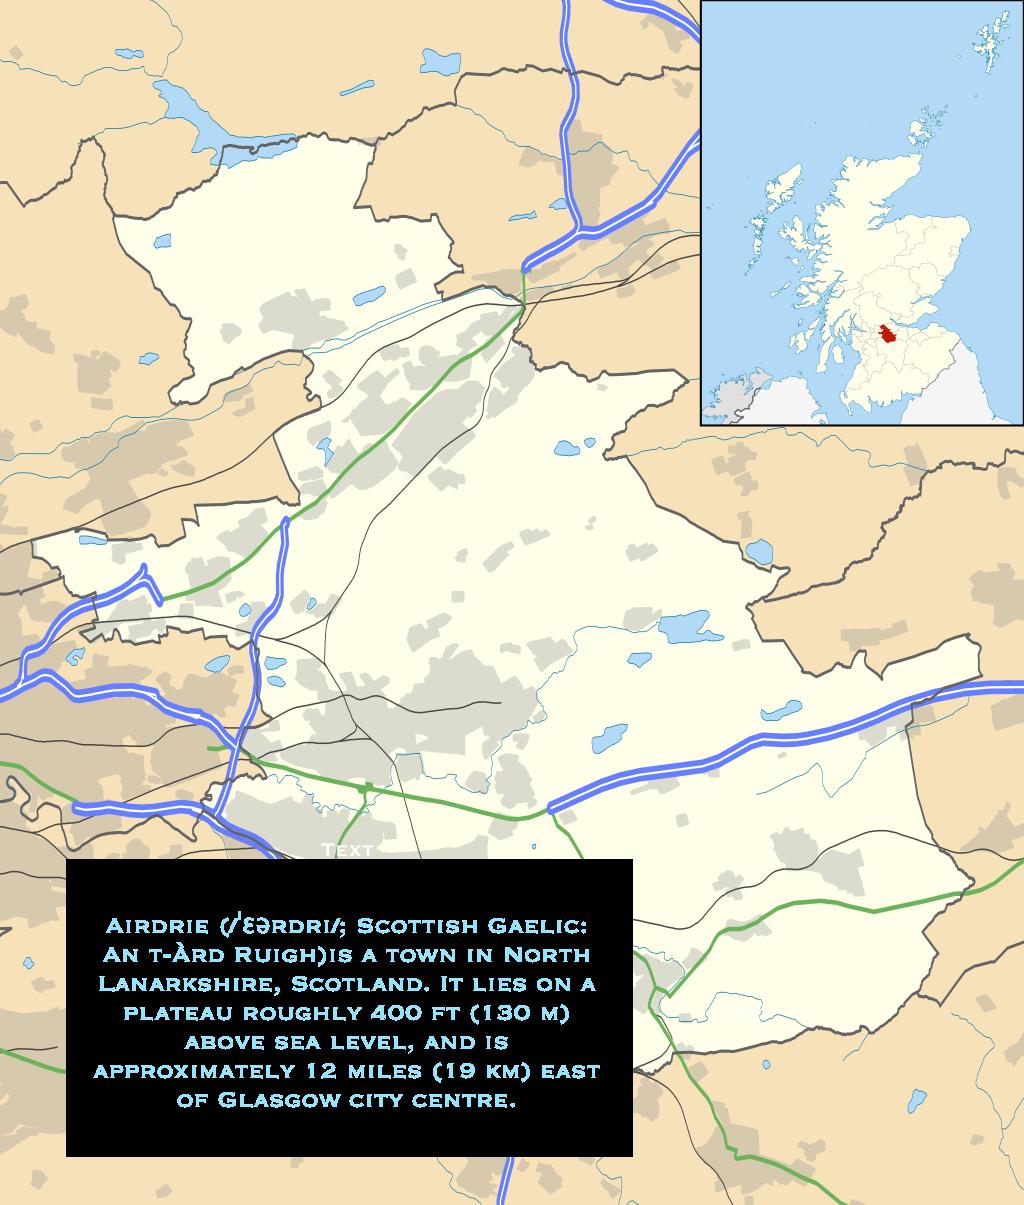 Airdrie, Scotland | MEDEA on map east lothian scotland, excelsior stadium, airdrie public library, lanark high church glasgow scotland, map of airdrie alberta, map of glasgow ky, airdrie-bathgate rail link, airdrie and shotts, airdrie public observatory, airdrie lanarkshire scotland,